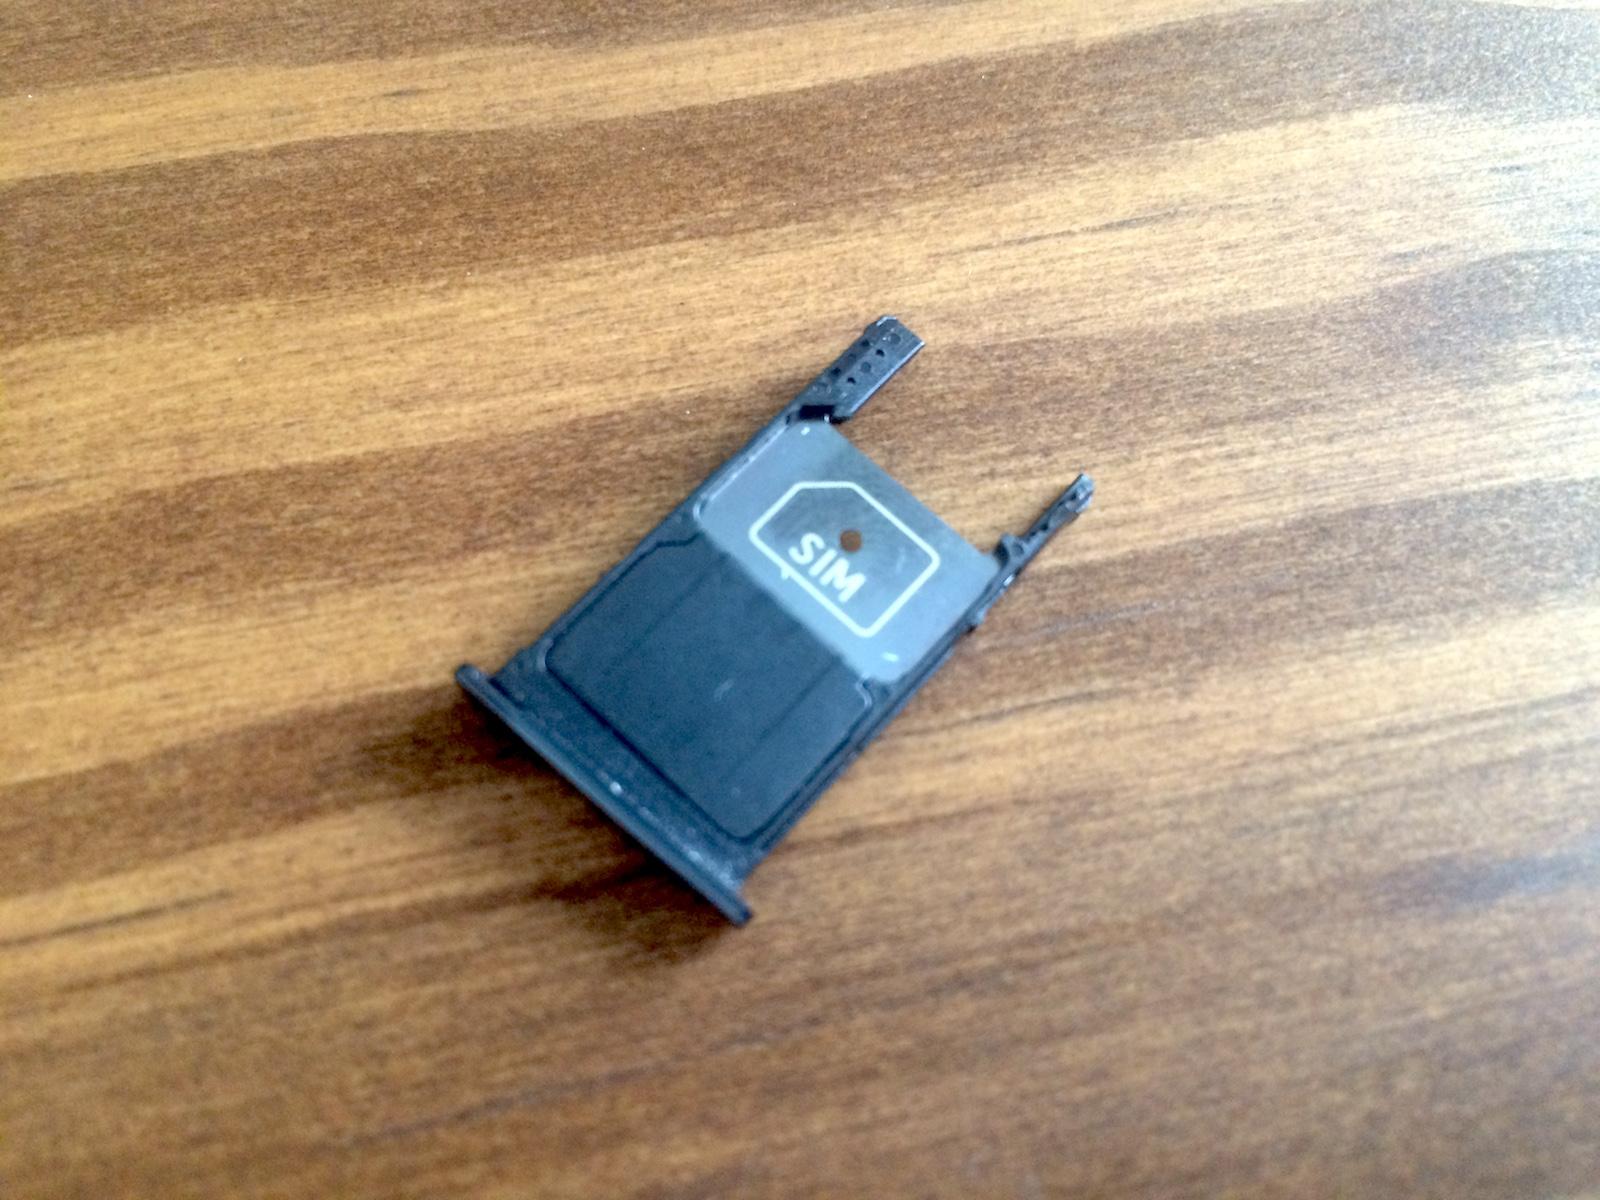 Moto X Play SIM-Schacht der Single-SIM Variante (Bild: Benjamin Blessing).